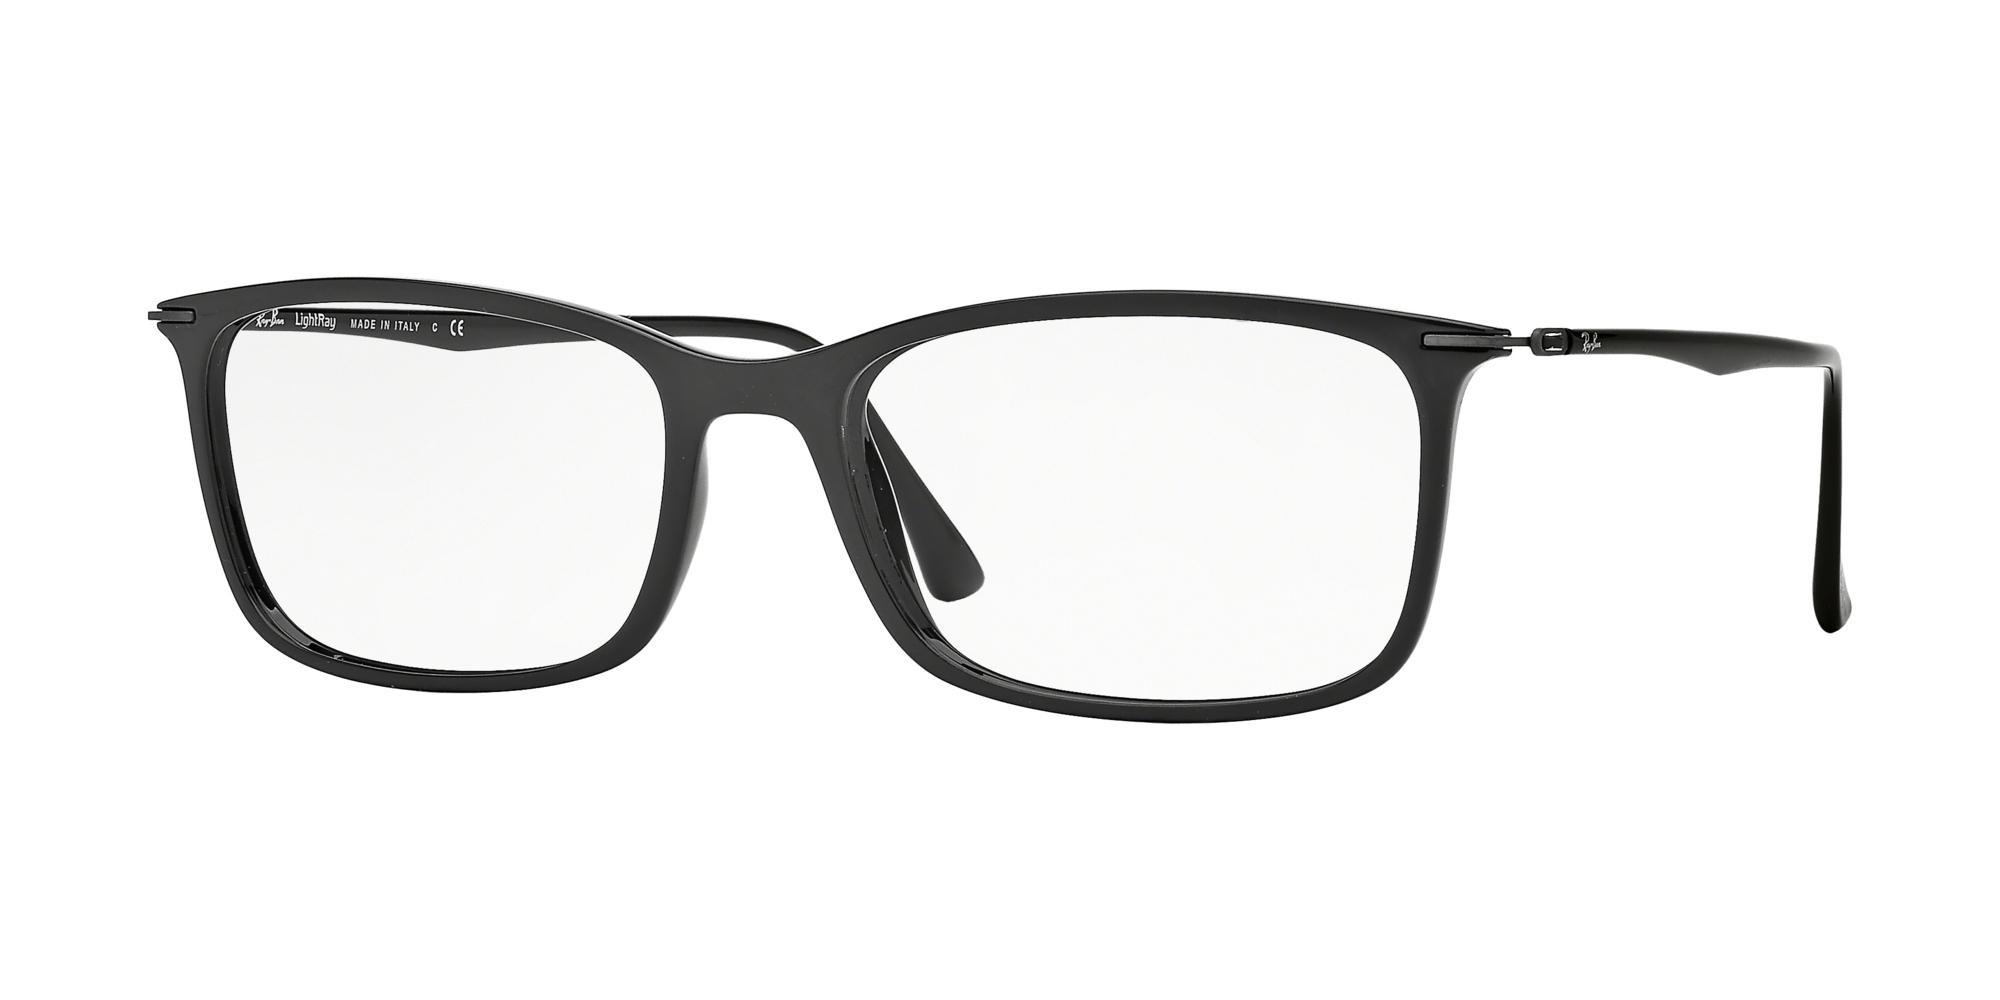 Ray-Ban eyeglasses RX 7031